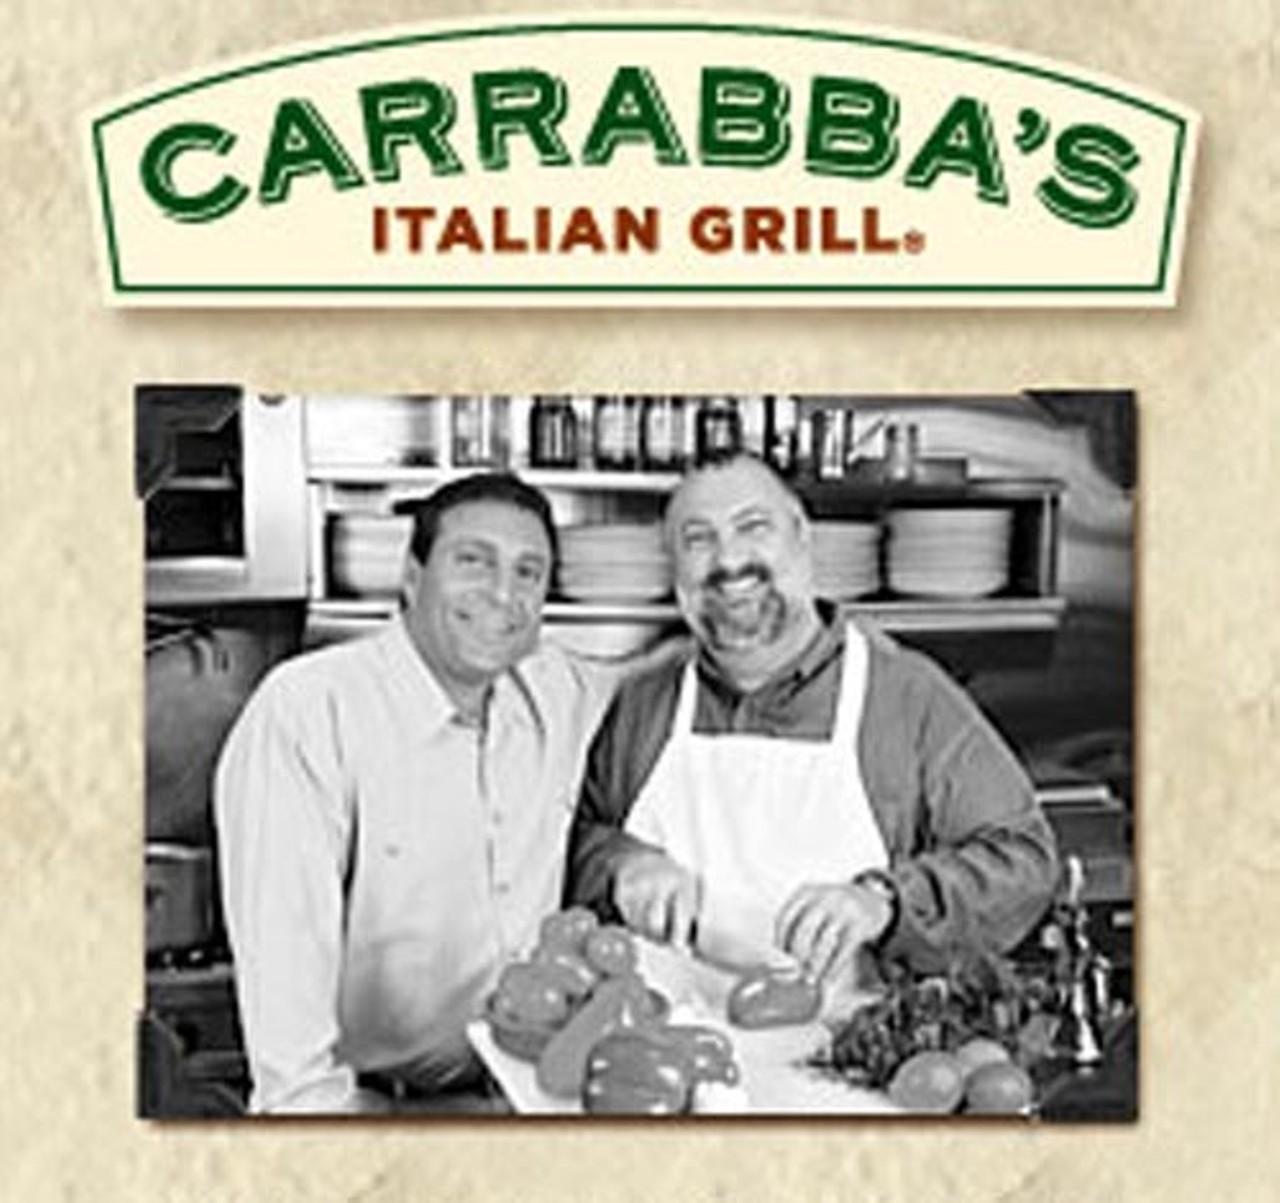 photo about Carrabba's Printable Menu identified as Carrabbas Italian Grill East Memphis Italian Cafe